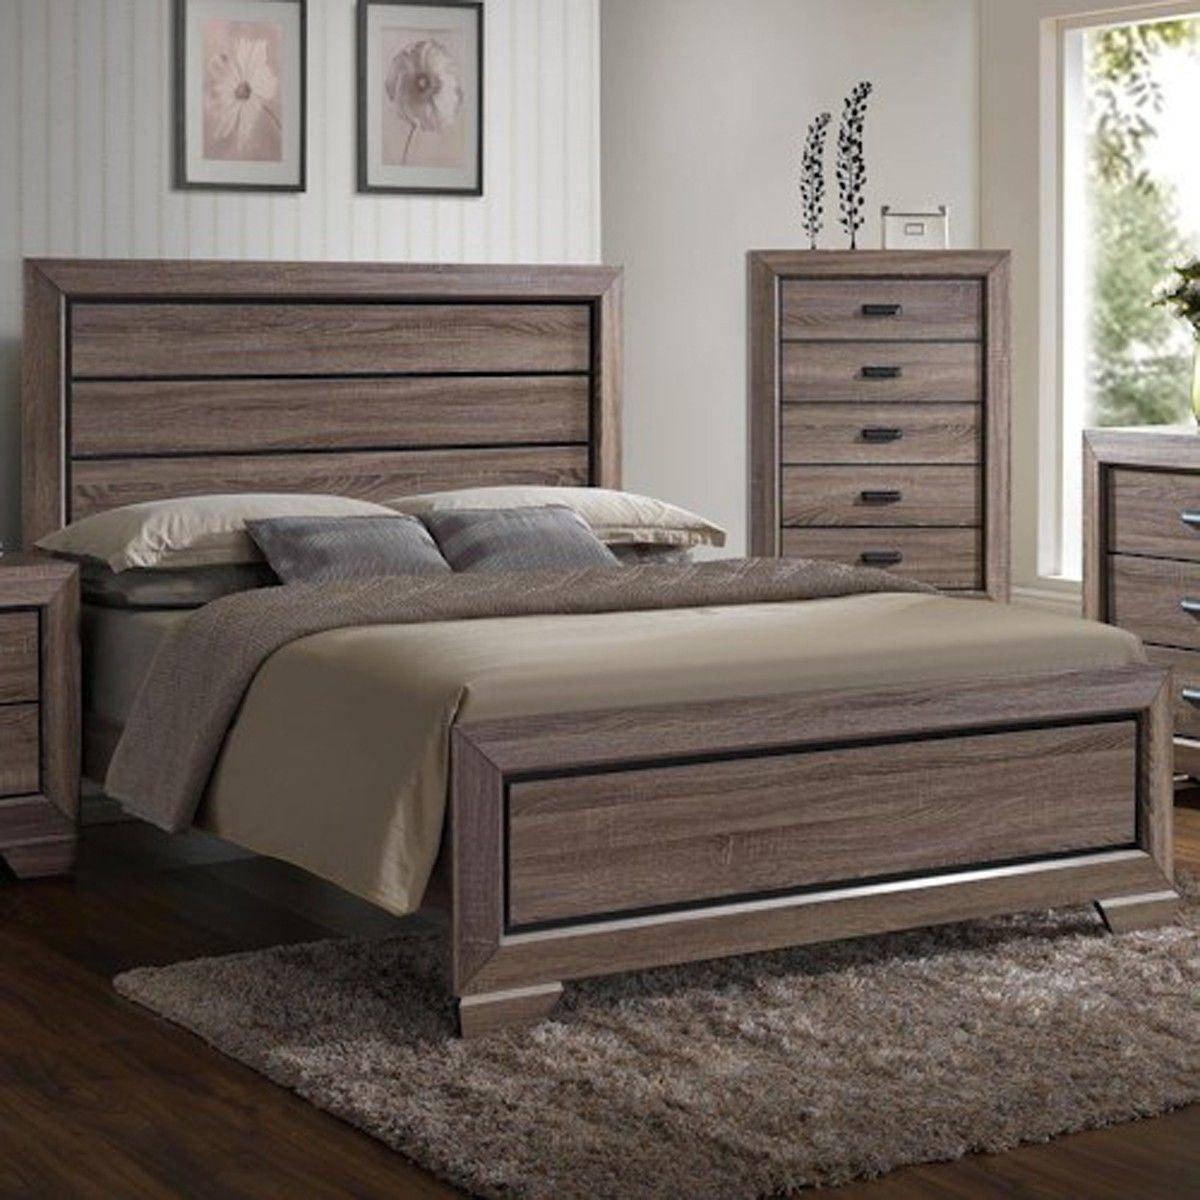 Solid Oak Bedroom Furniture Elegant Crown Mark B5500 Farrow Grey Brown Finish solid Wood Queen